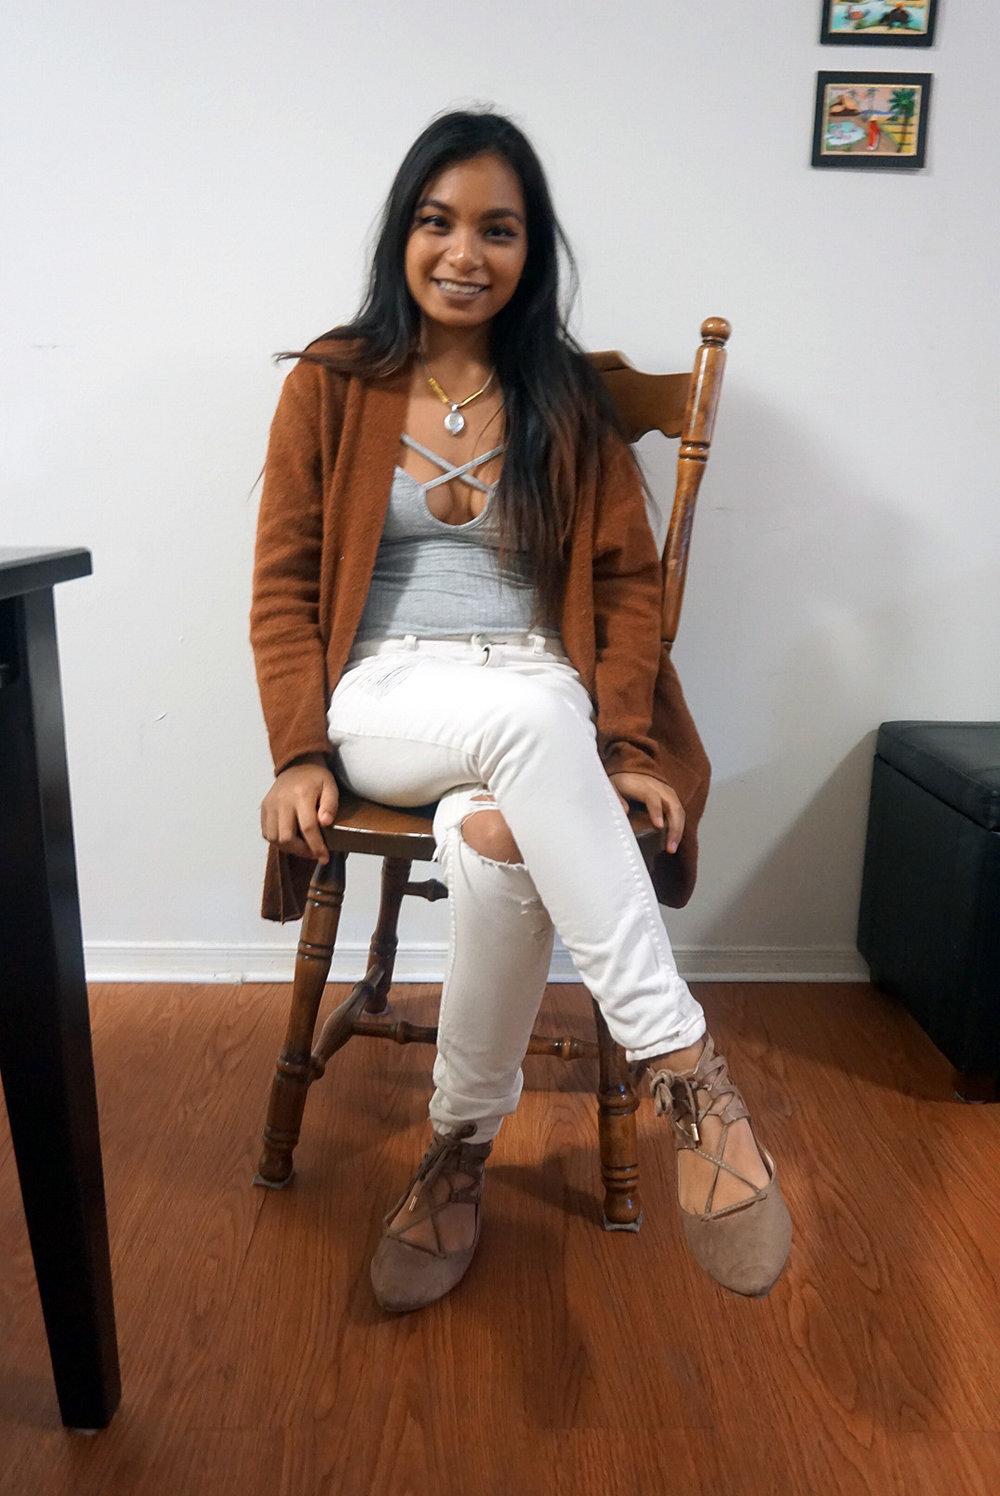 Caramel-Cardigan-Camel-Cardigan-Bodysuit-Boyfriend-Jeans-Ripped-Jeans-Blogger-Style-Casual-Look-LINDATENCHITRAN-1-1080x1616.jpg